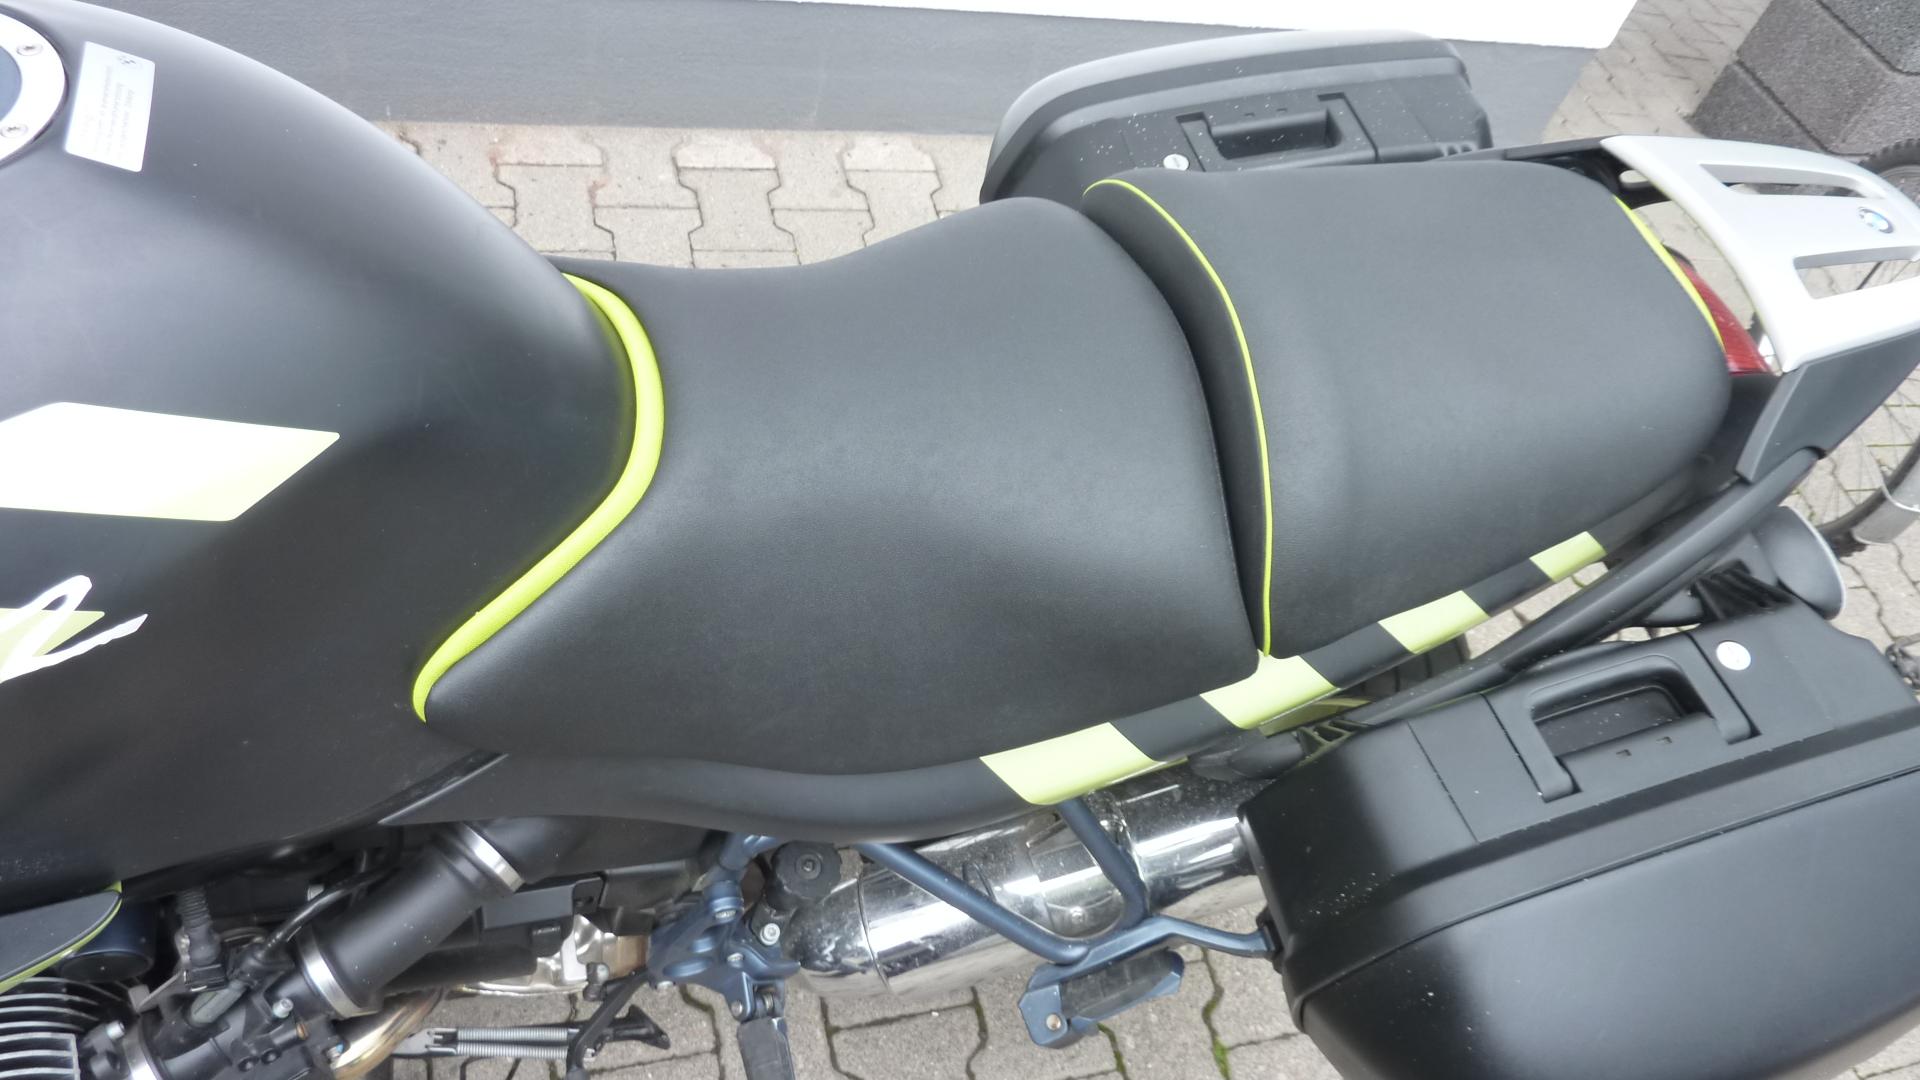 sitzbank bmw motorrad motorrad bild idee. Black Bedroom Furniture Sets. Home Design Ideas